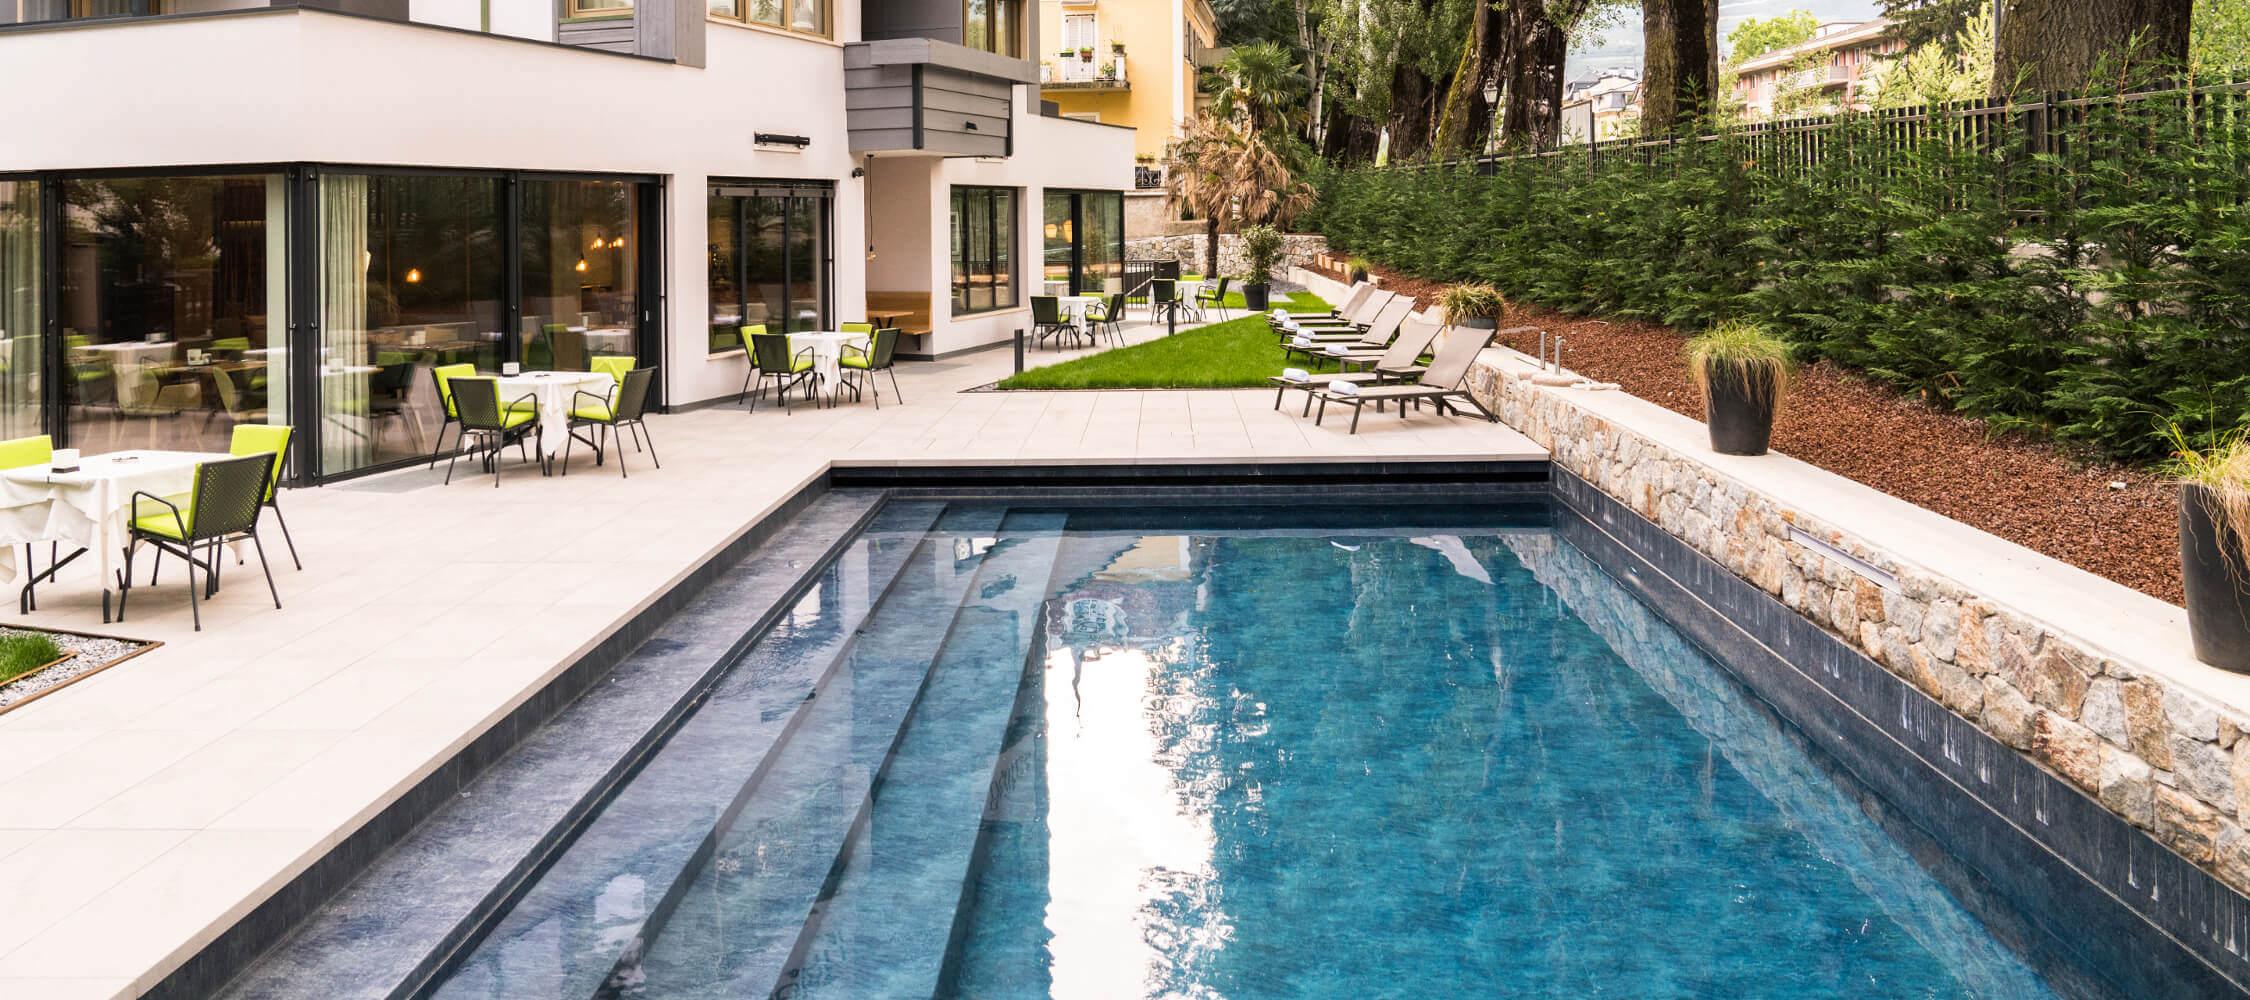 Hotel_Flora_Merano_Wellness_Garten_Freischwimmbad_BeatricePilottoDSC03527_2250x1000